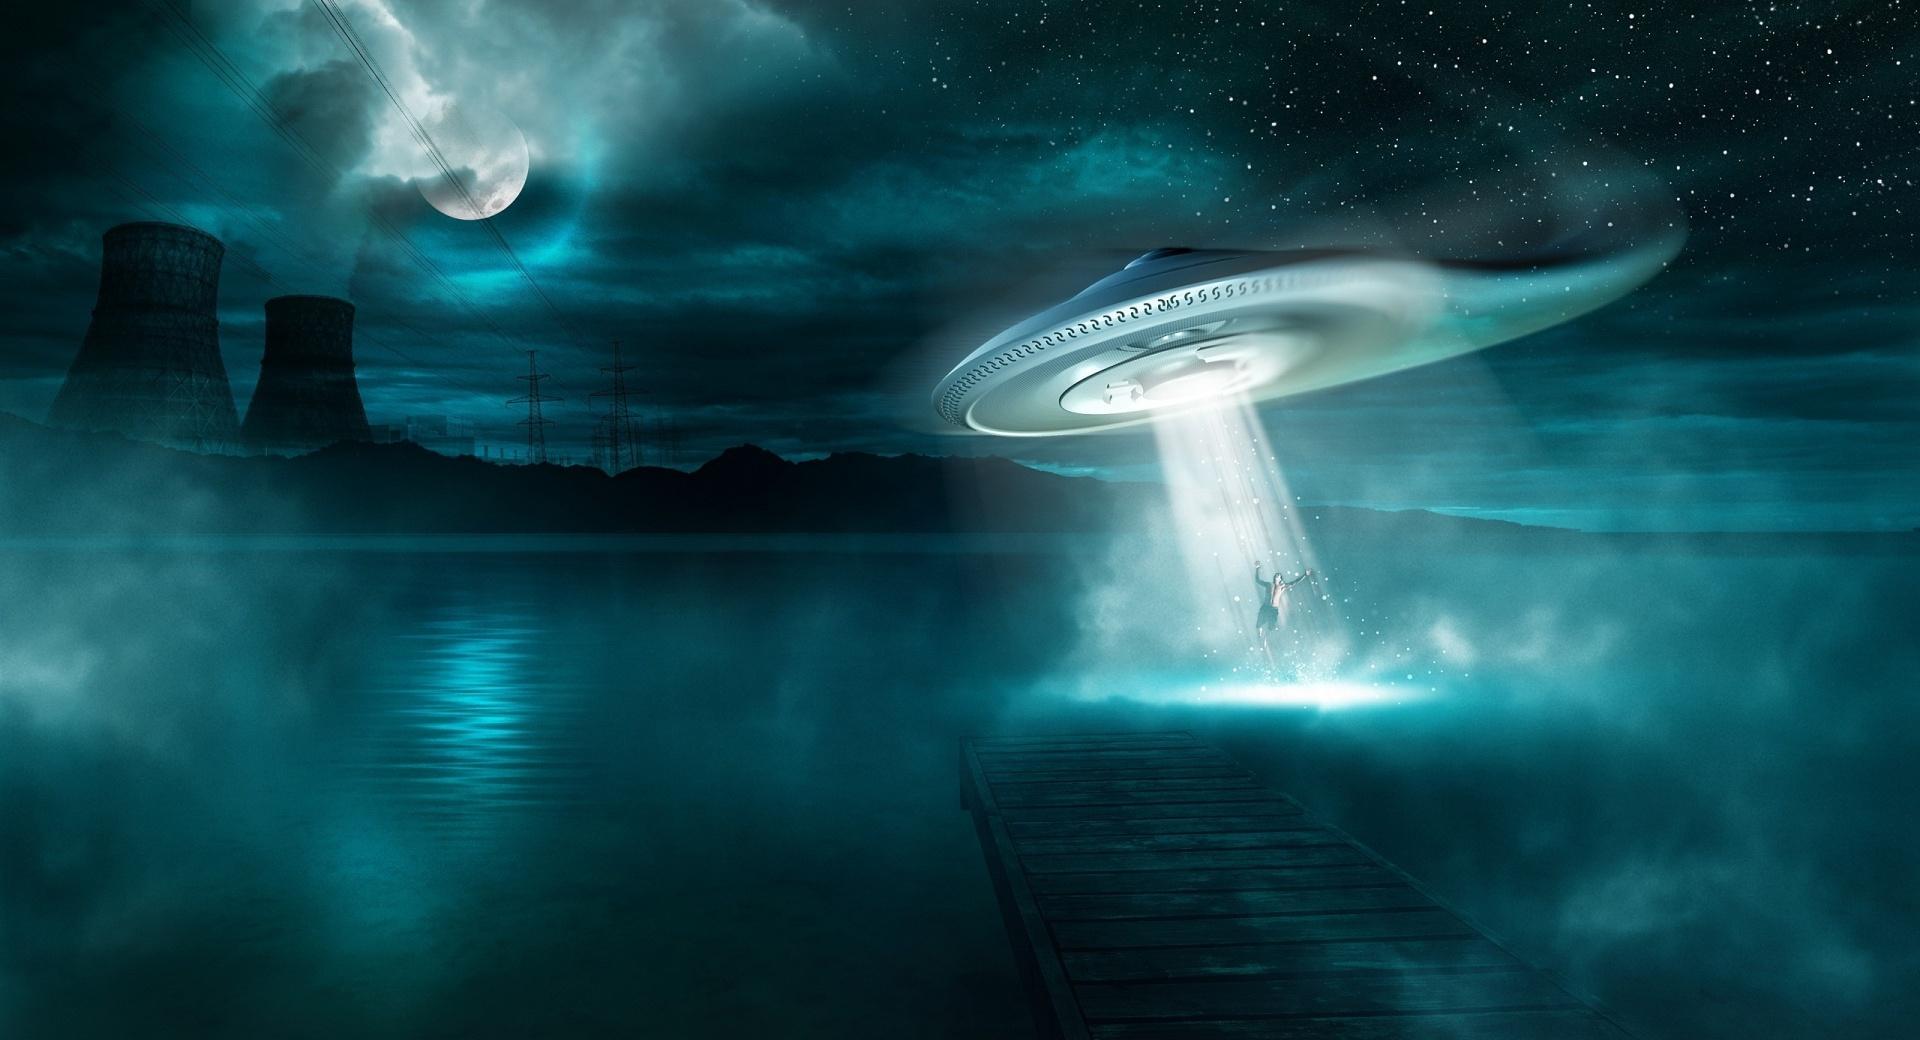 Taken By Aliens wallpapers HD quality